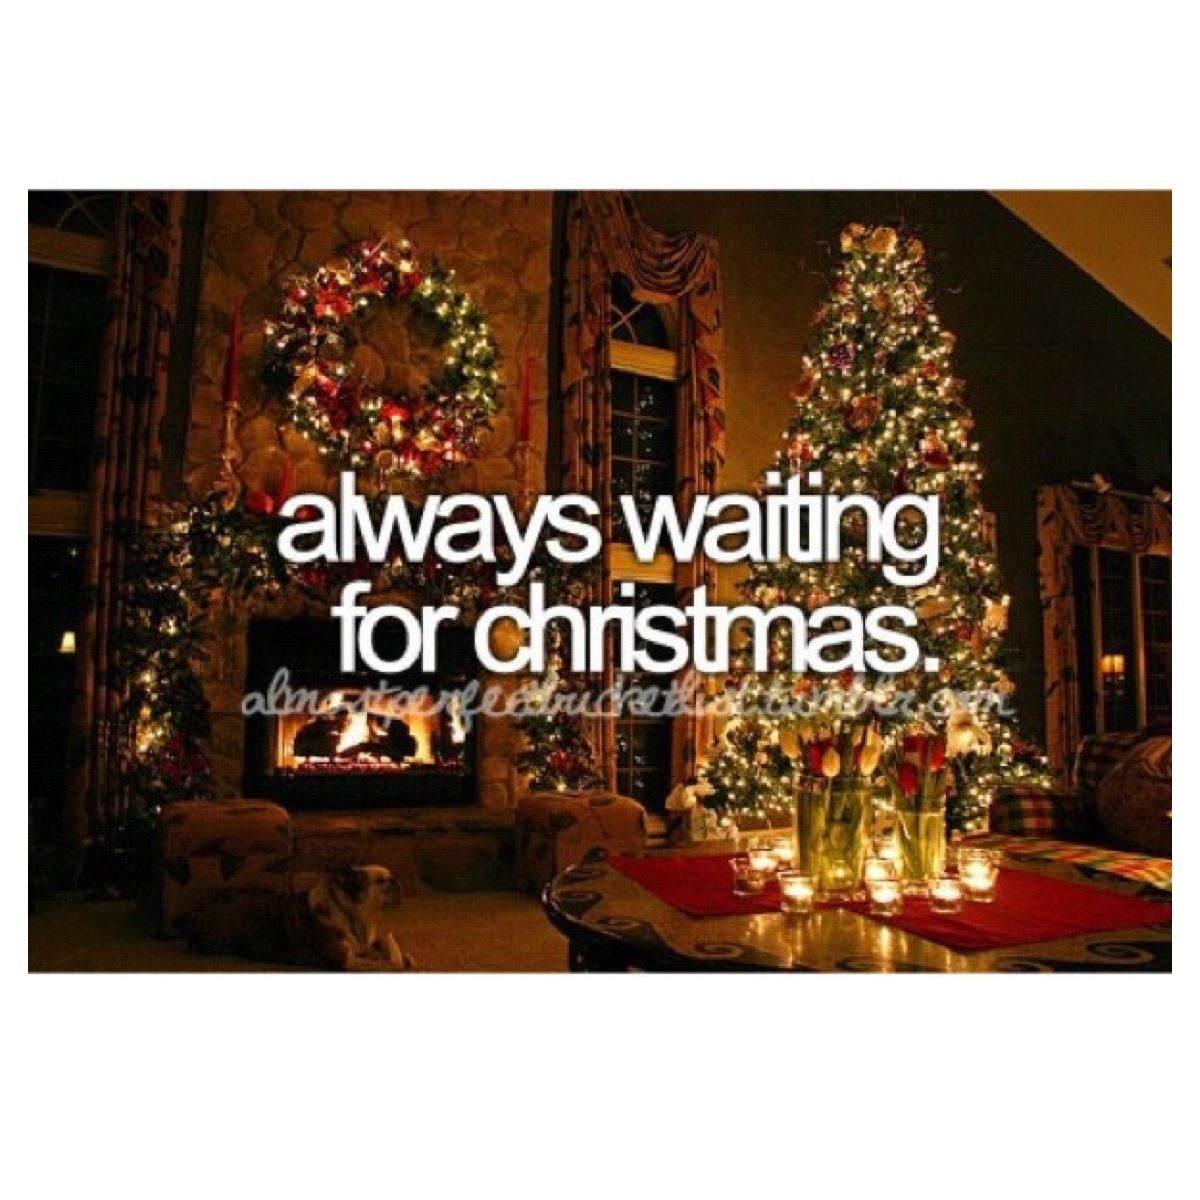 So Me Christmas Carols Songs Favorite Christmas Songs Christmas Music